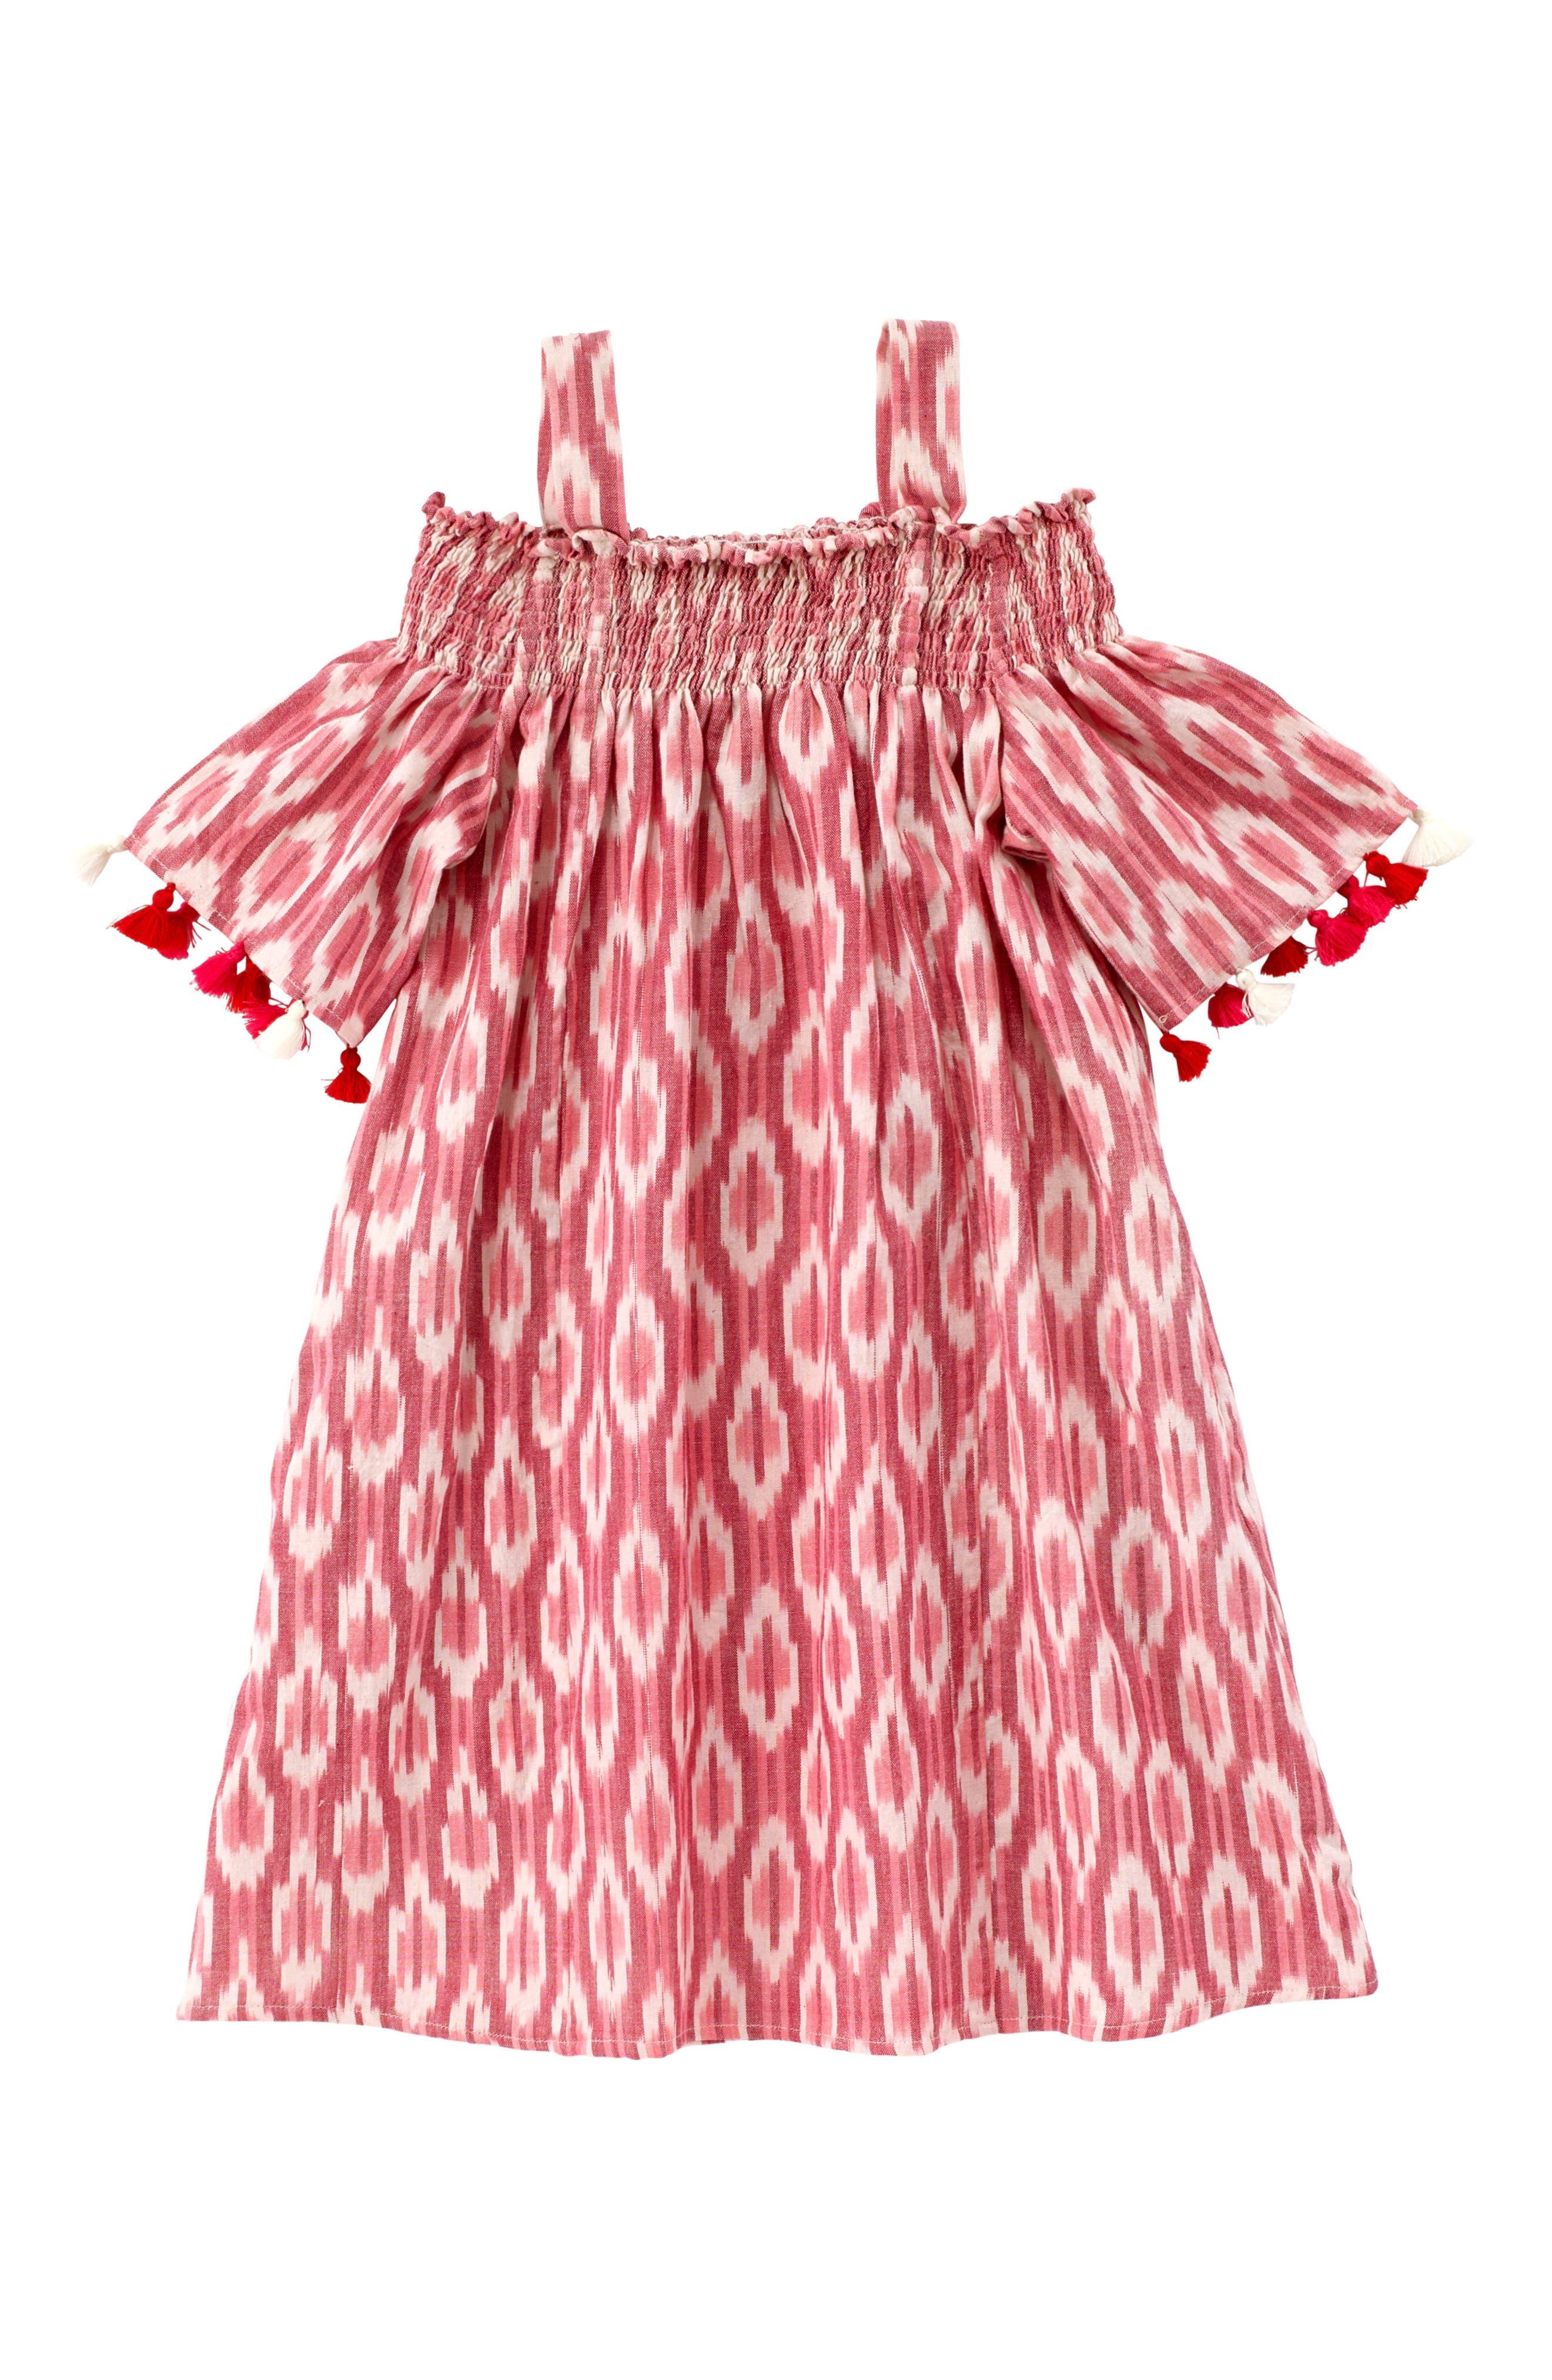 Alternate Image 1 Selected - Masala Baby Rohi Ikat Print Dress (Toddler Girls, Little Girls & Big Girls)